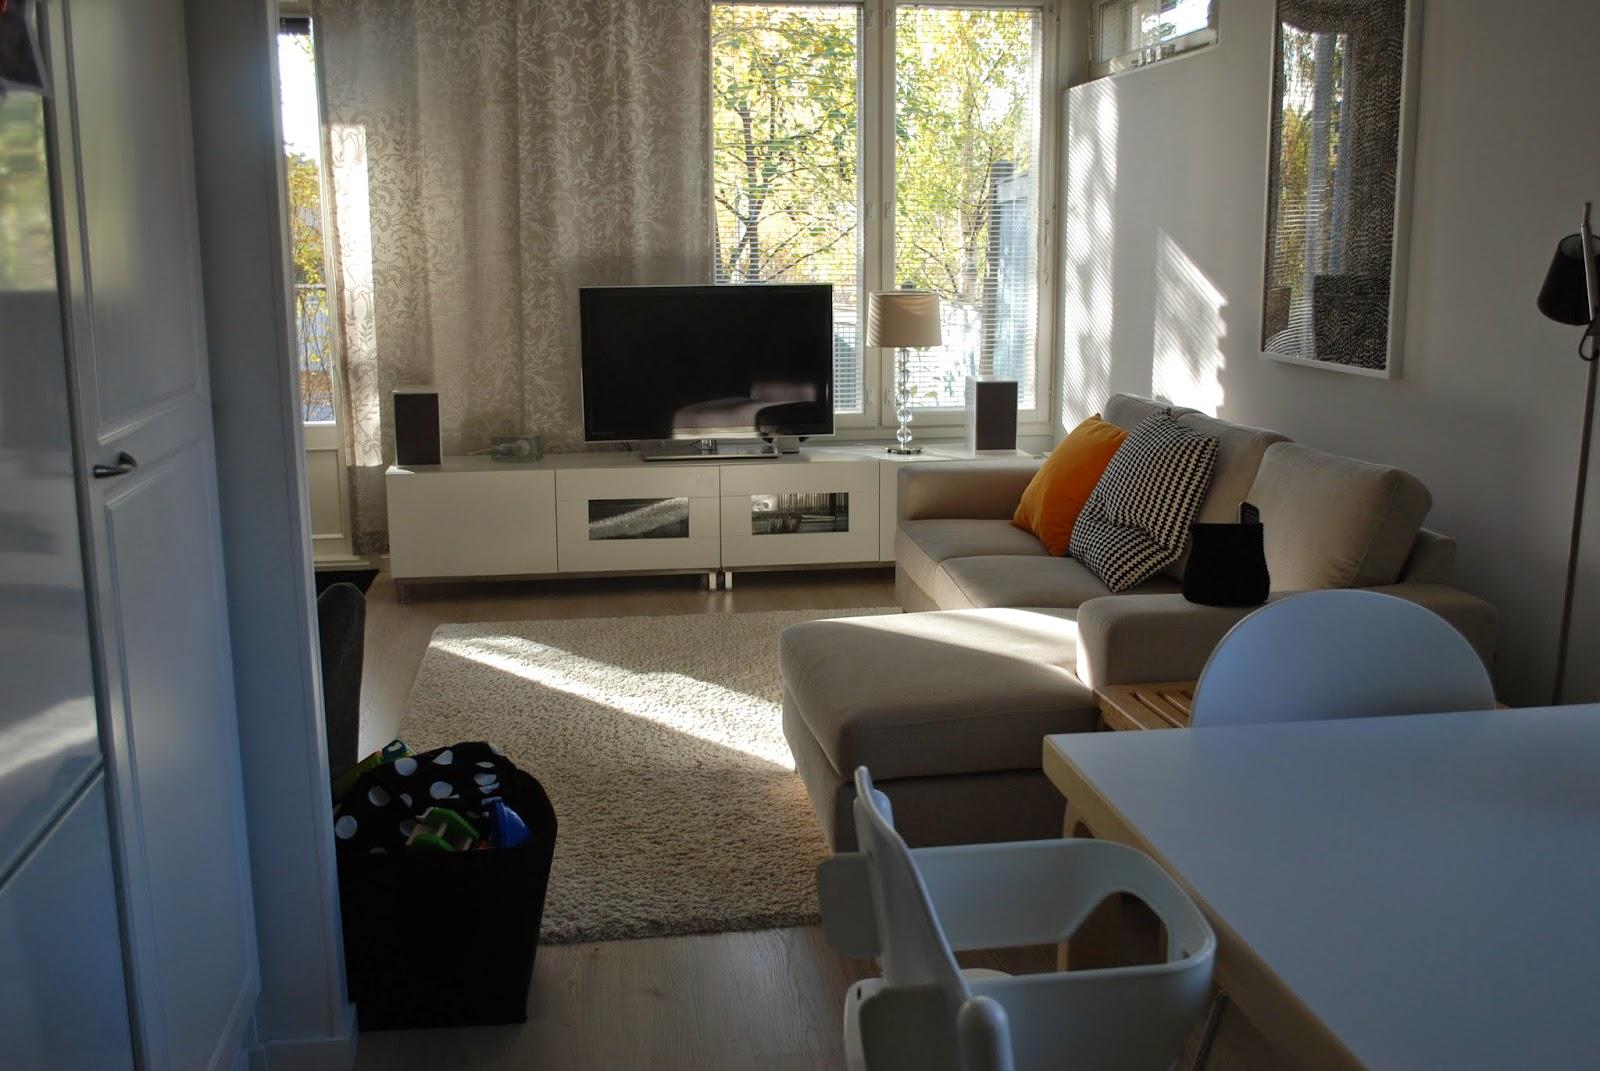 ZUBI'S CORNER Samat huonekalut, kaksi eri olohuonetta